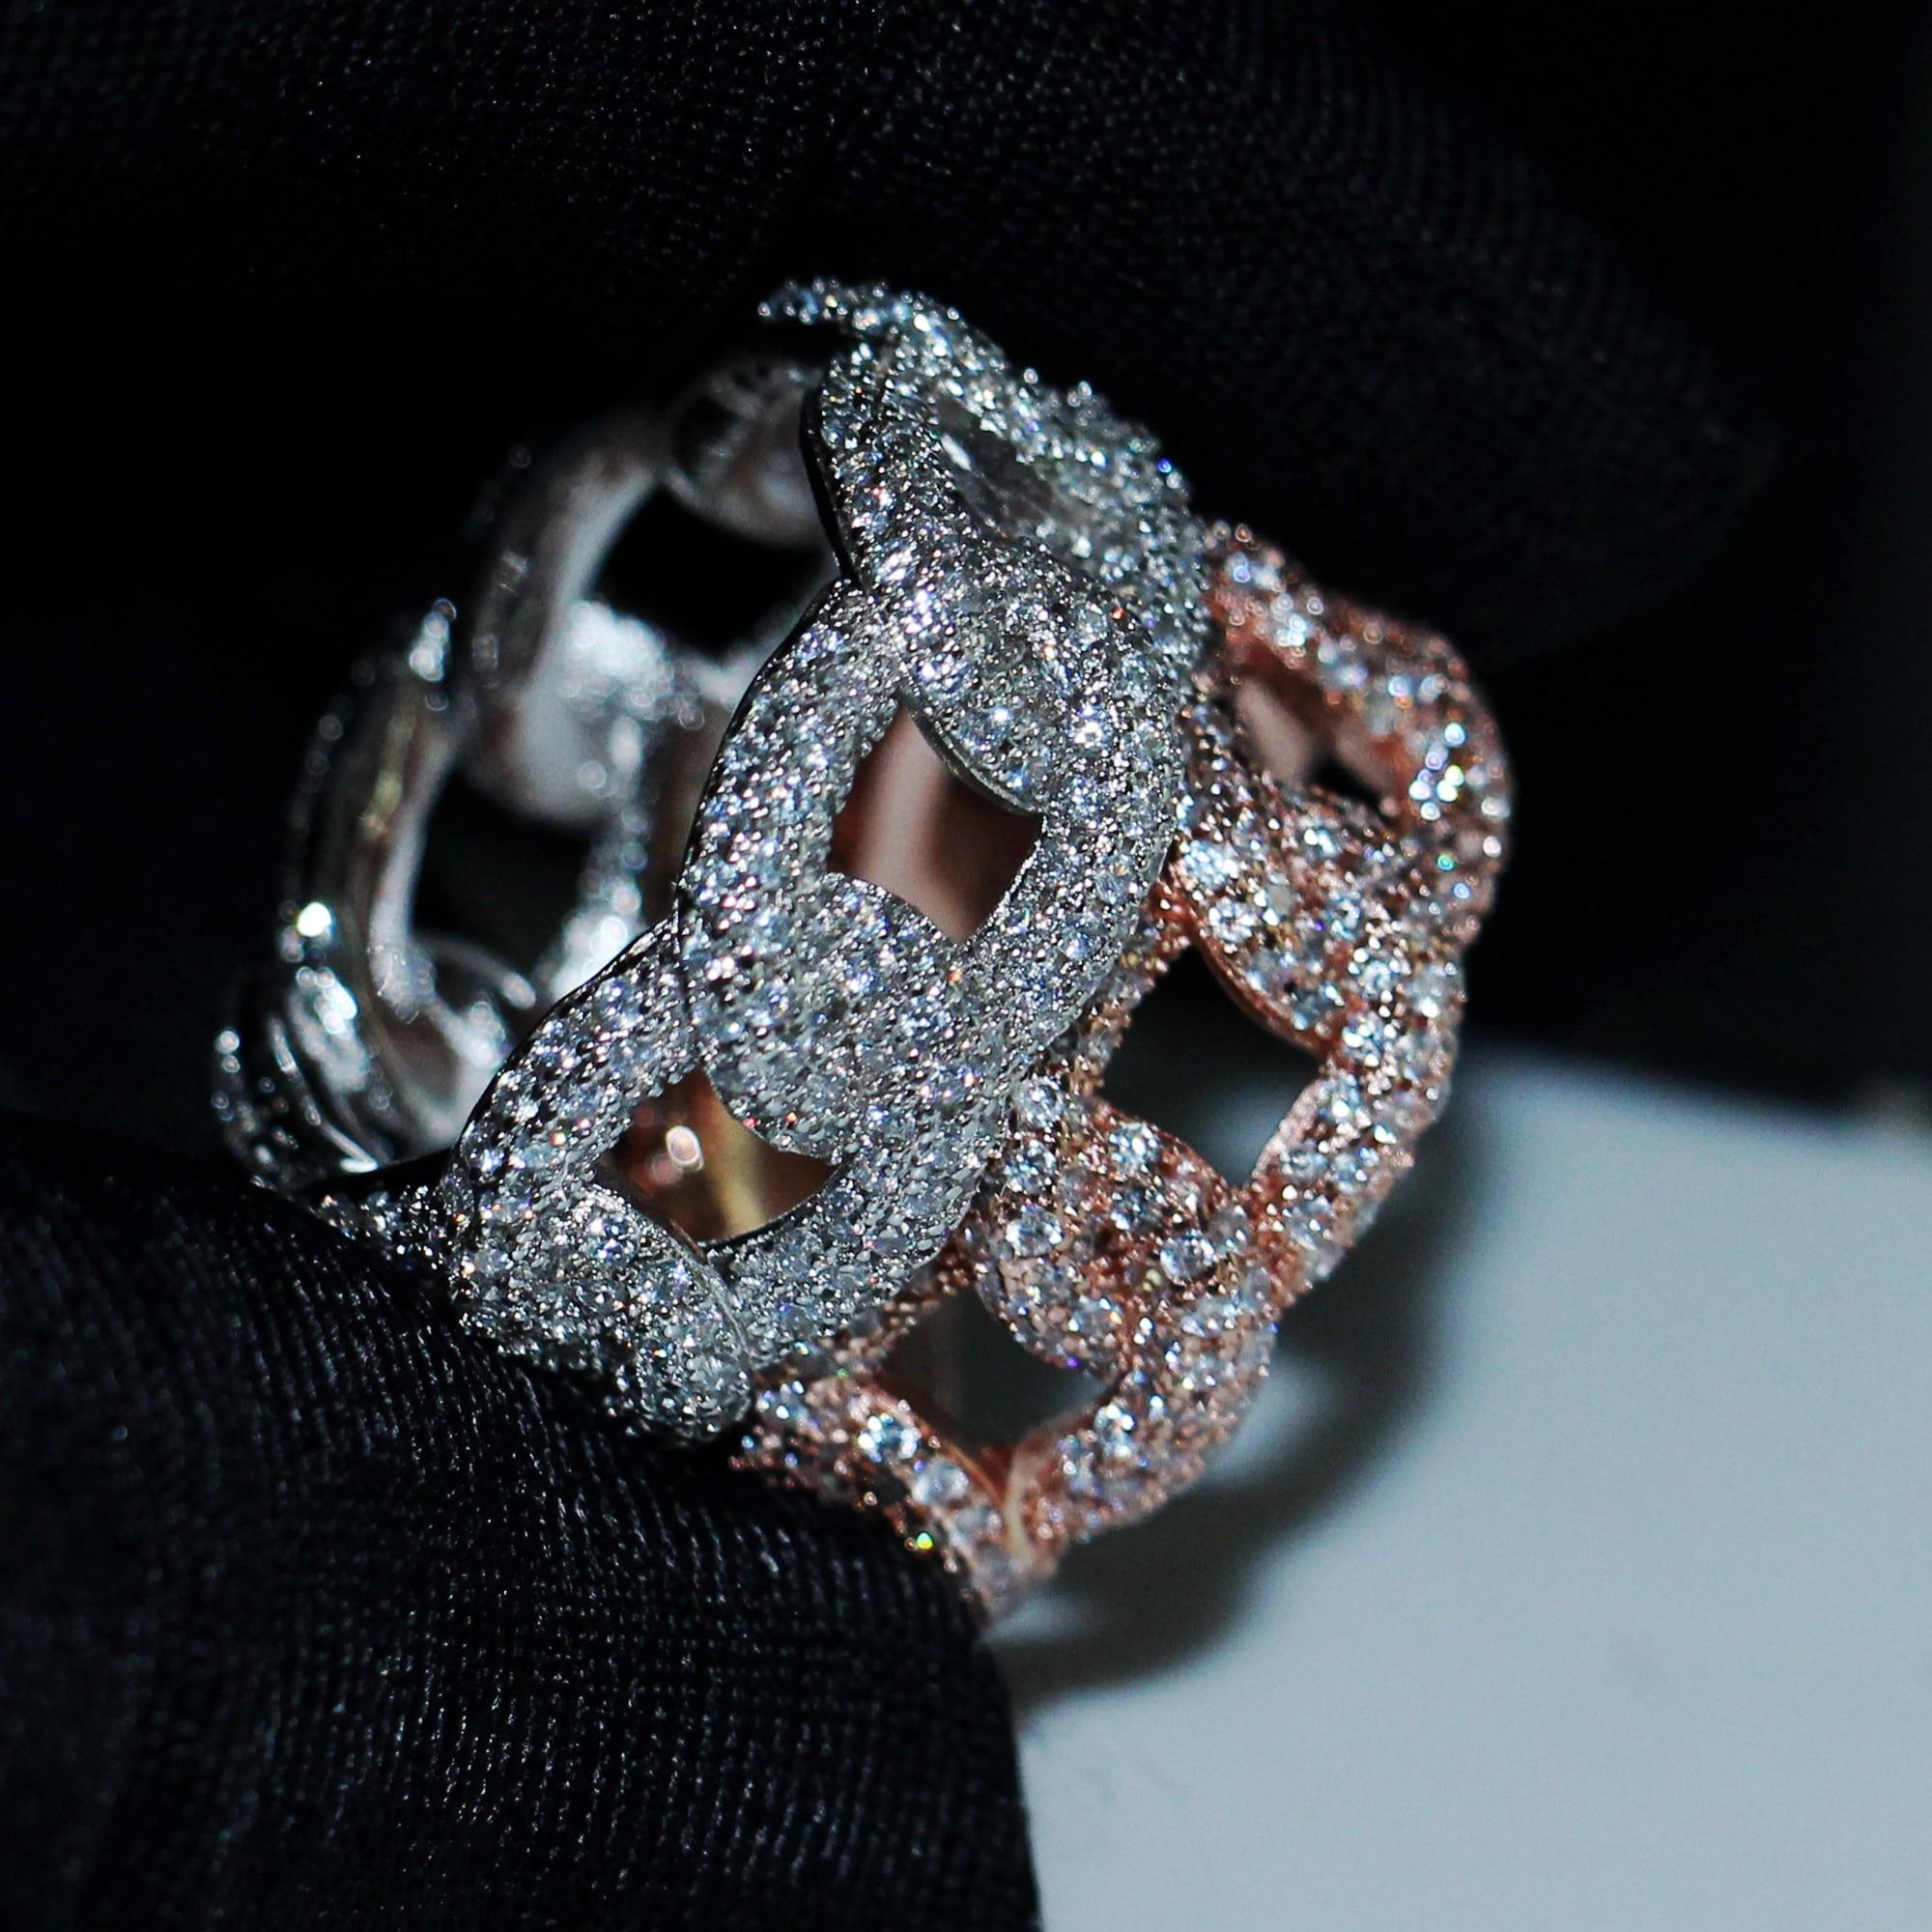 2019 Hip Hop Vintage joyería 925 Plata de Ley pavé blanco claro 5A cúbico Zirconia fiesta Cruz cadena boda anillo nupcial regalo